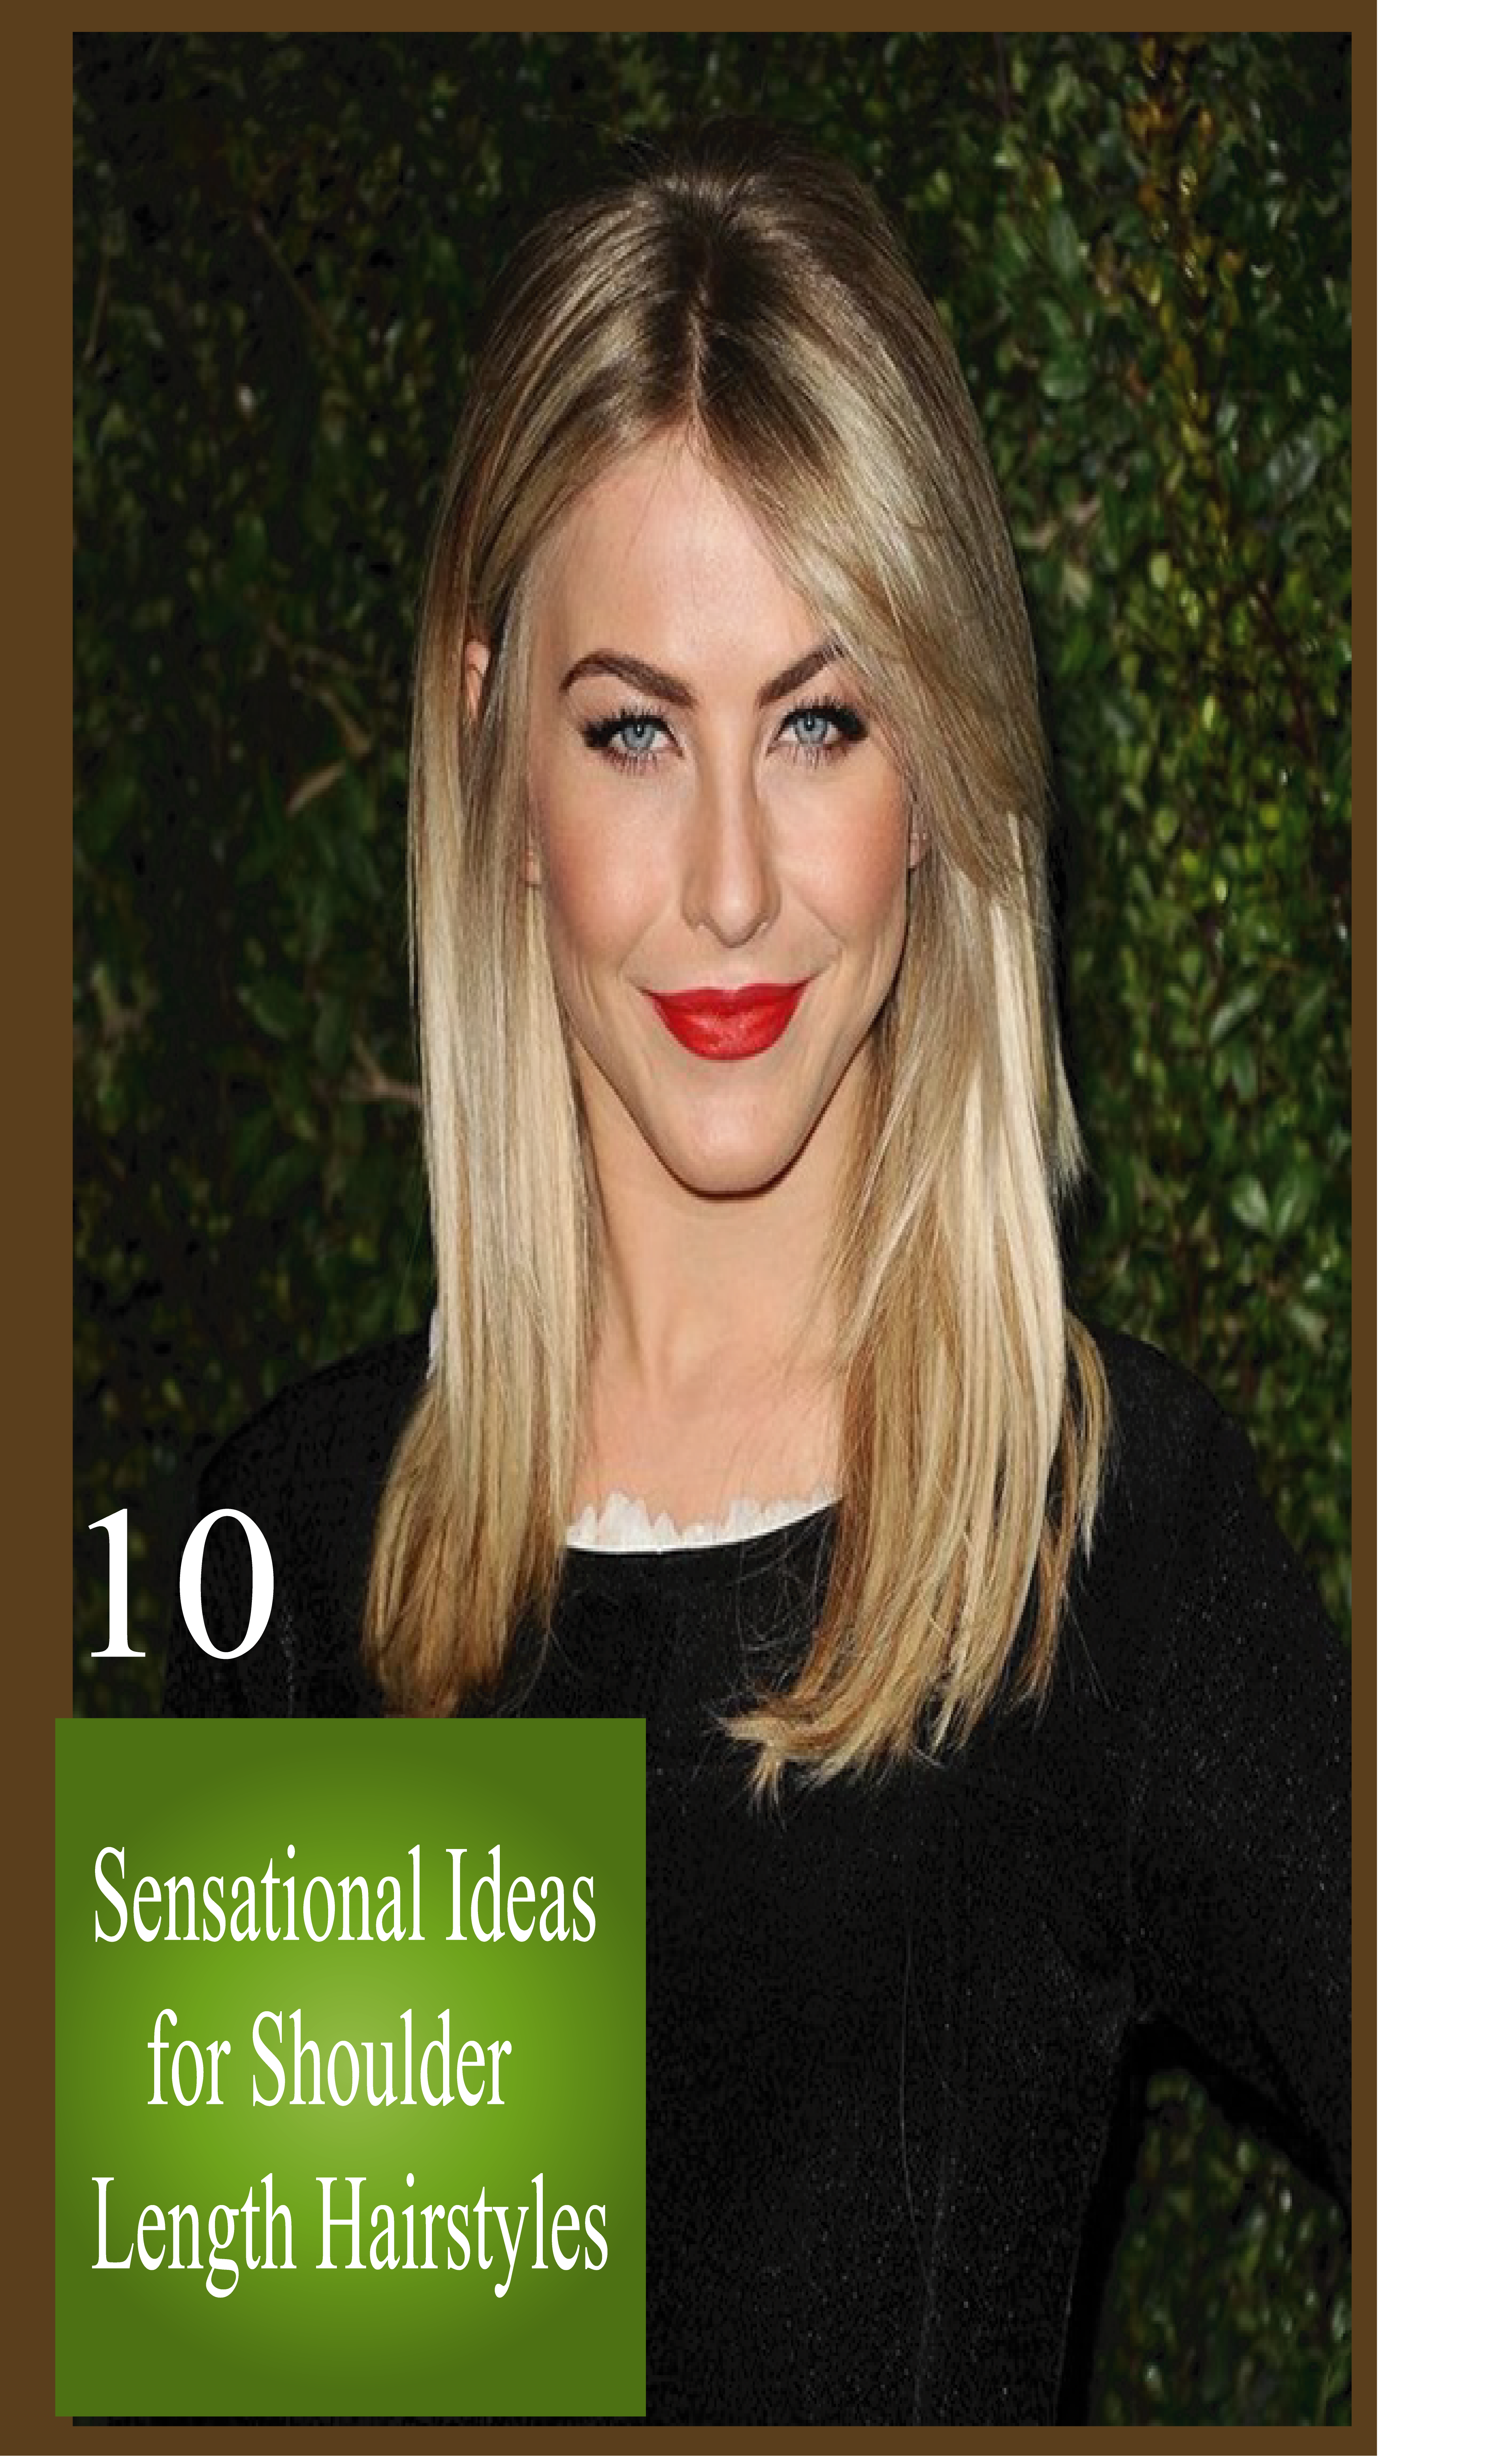 sensational ideas for shoulder length hairstyles modern